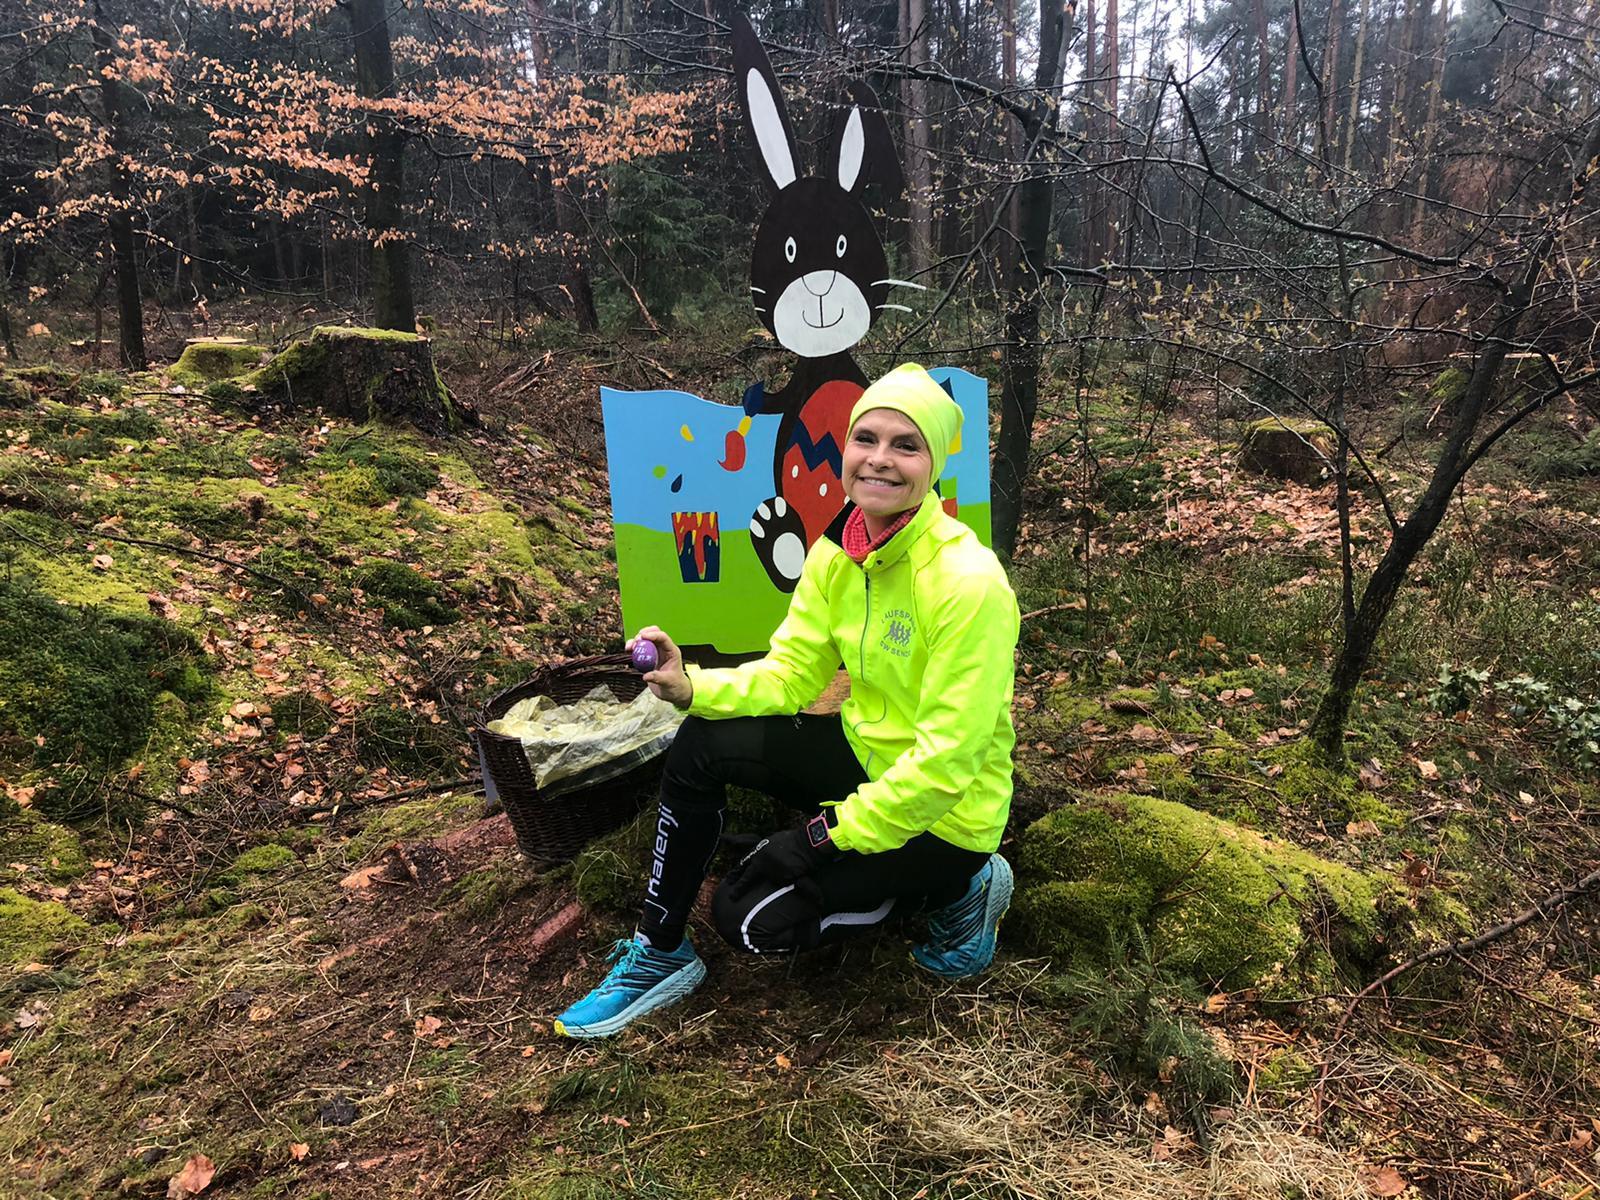 Sommerfeld-Nicola-12-Challenge-Oster-Challenge-NOdUE